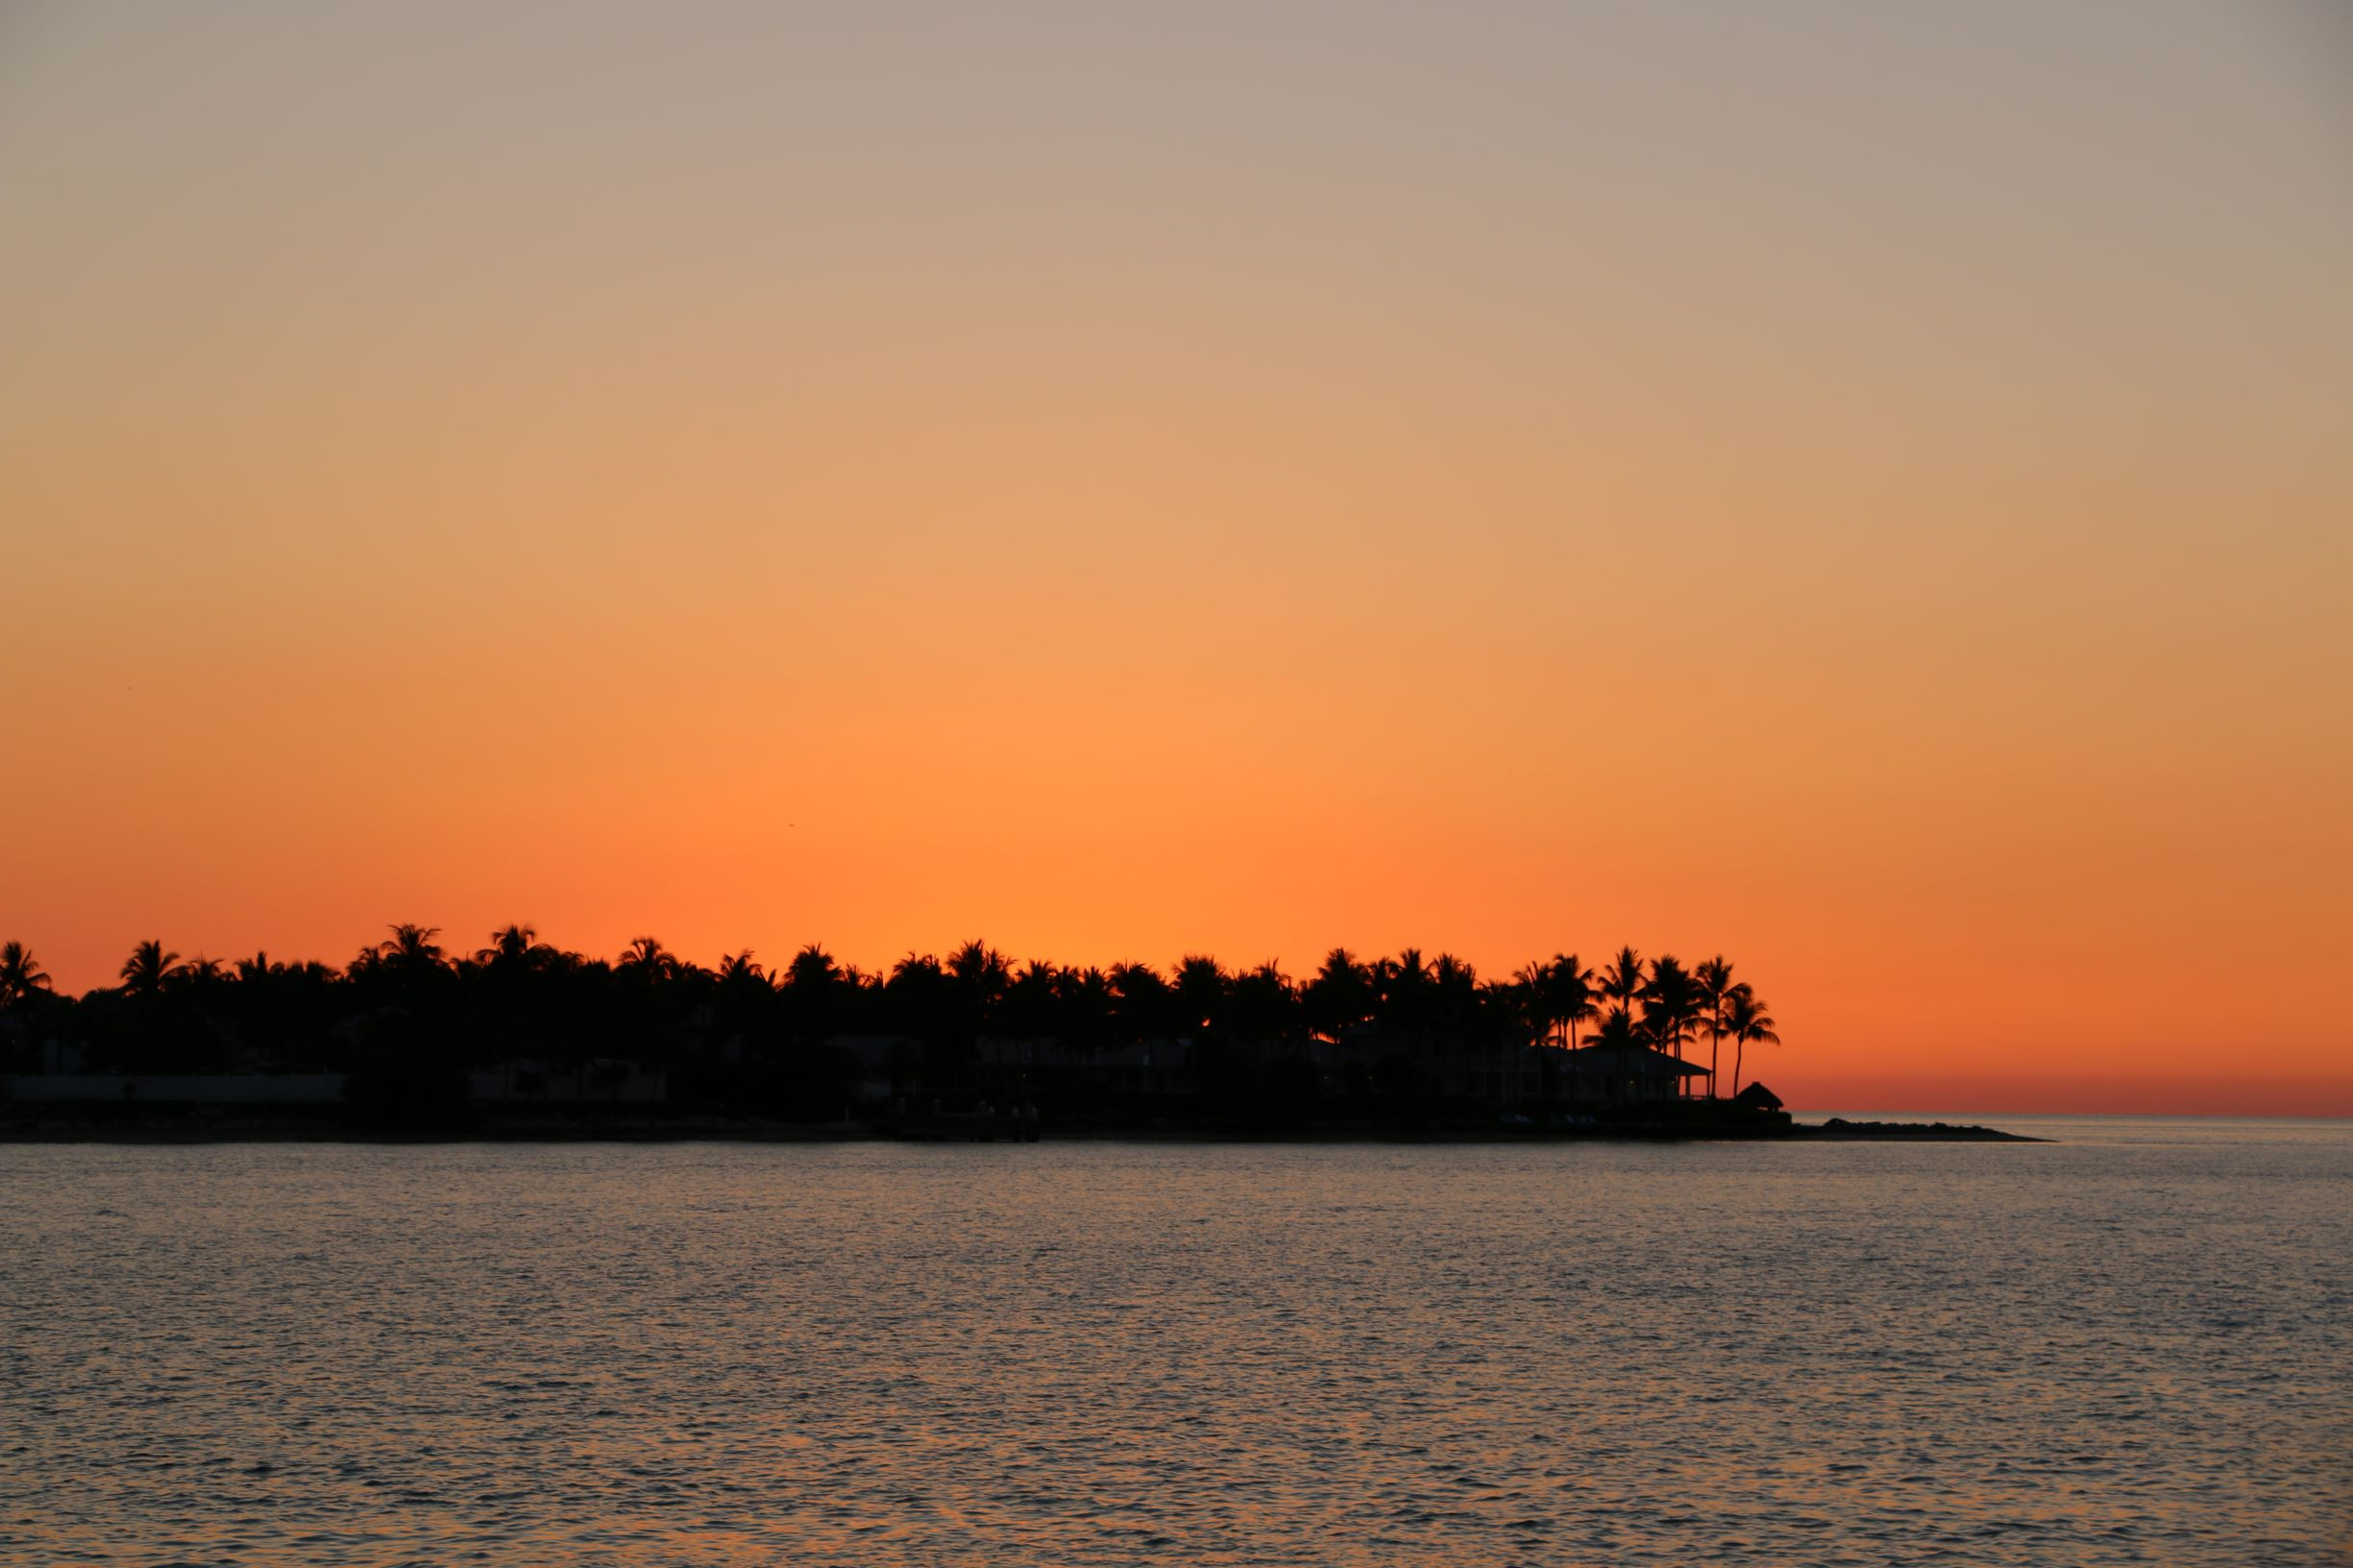 Sunset Key im Sonnenuntergang